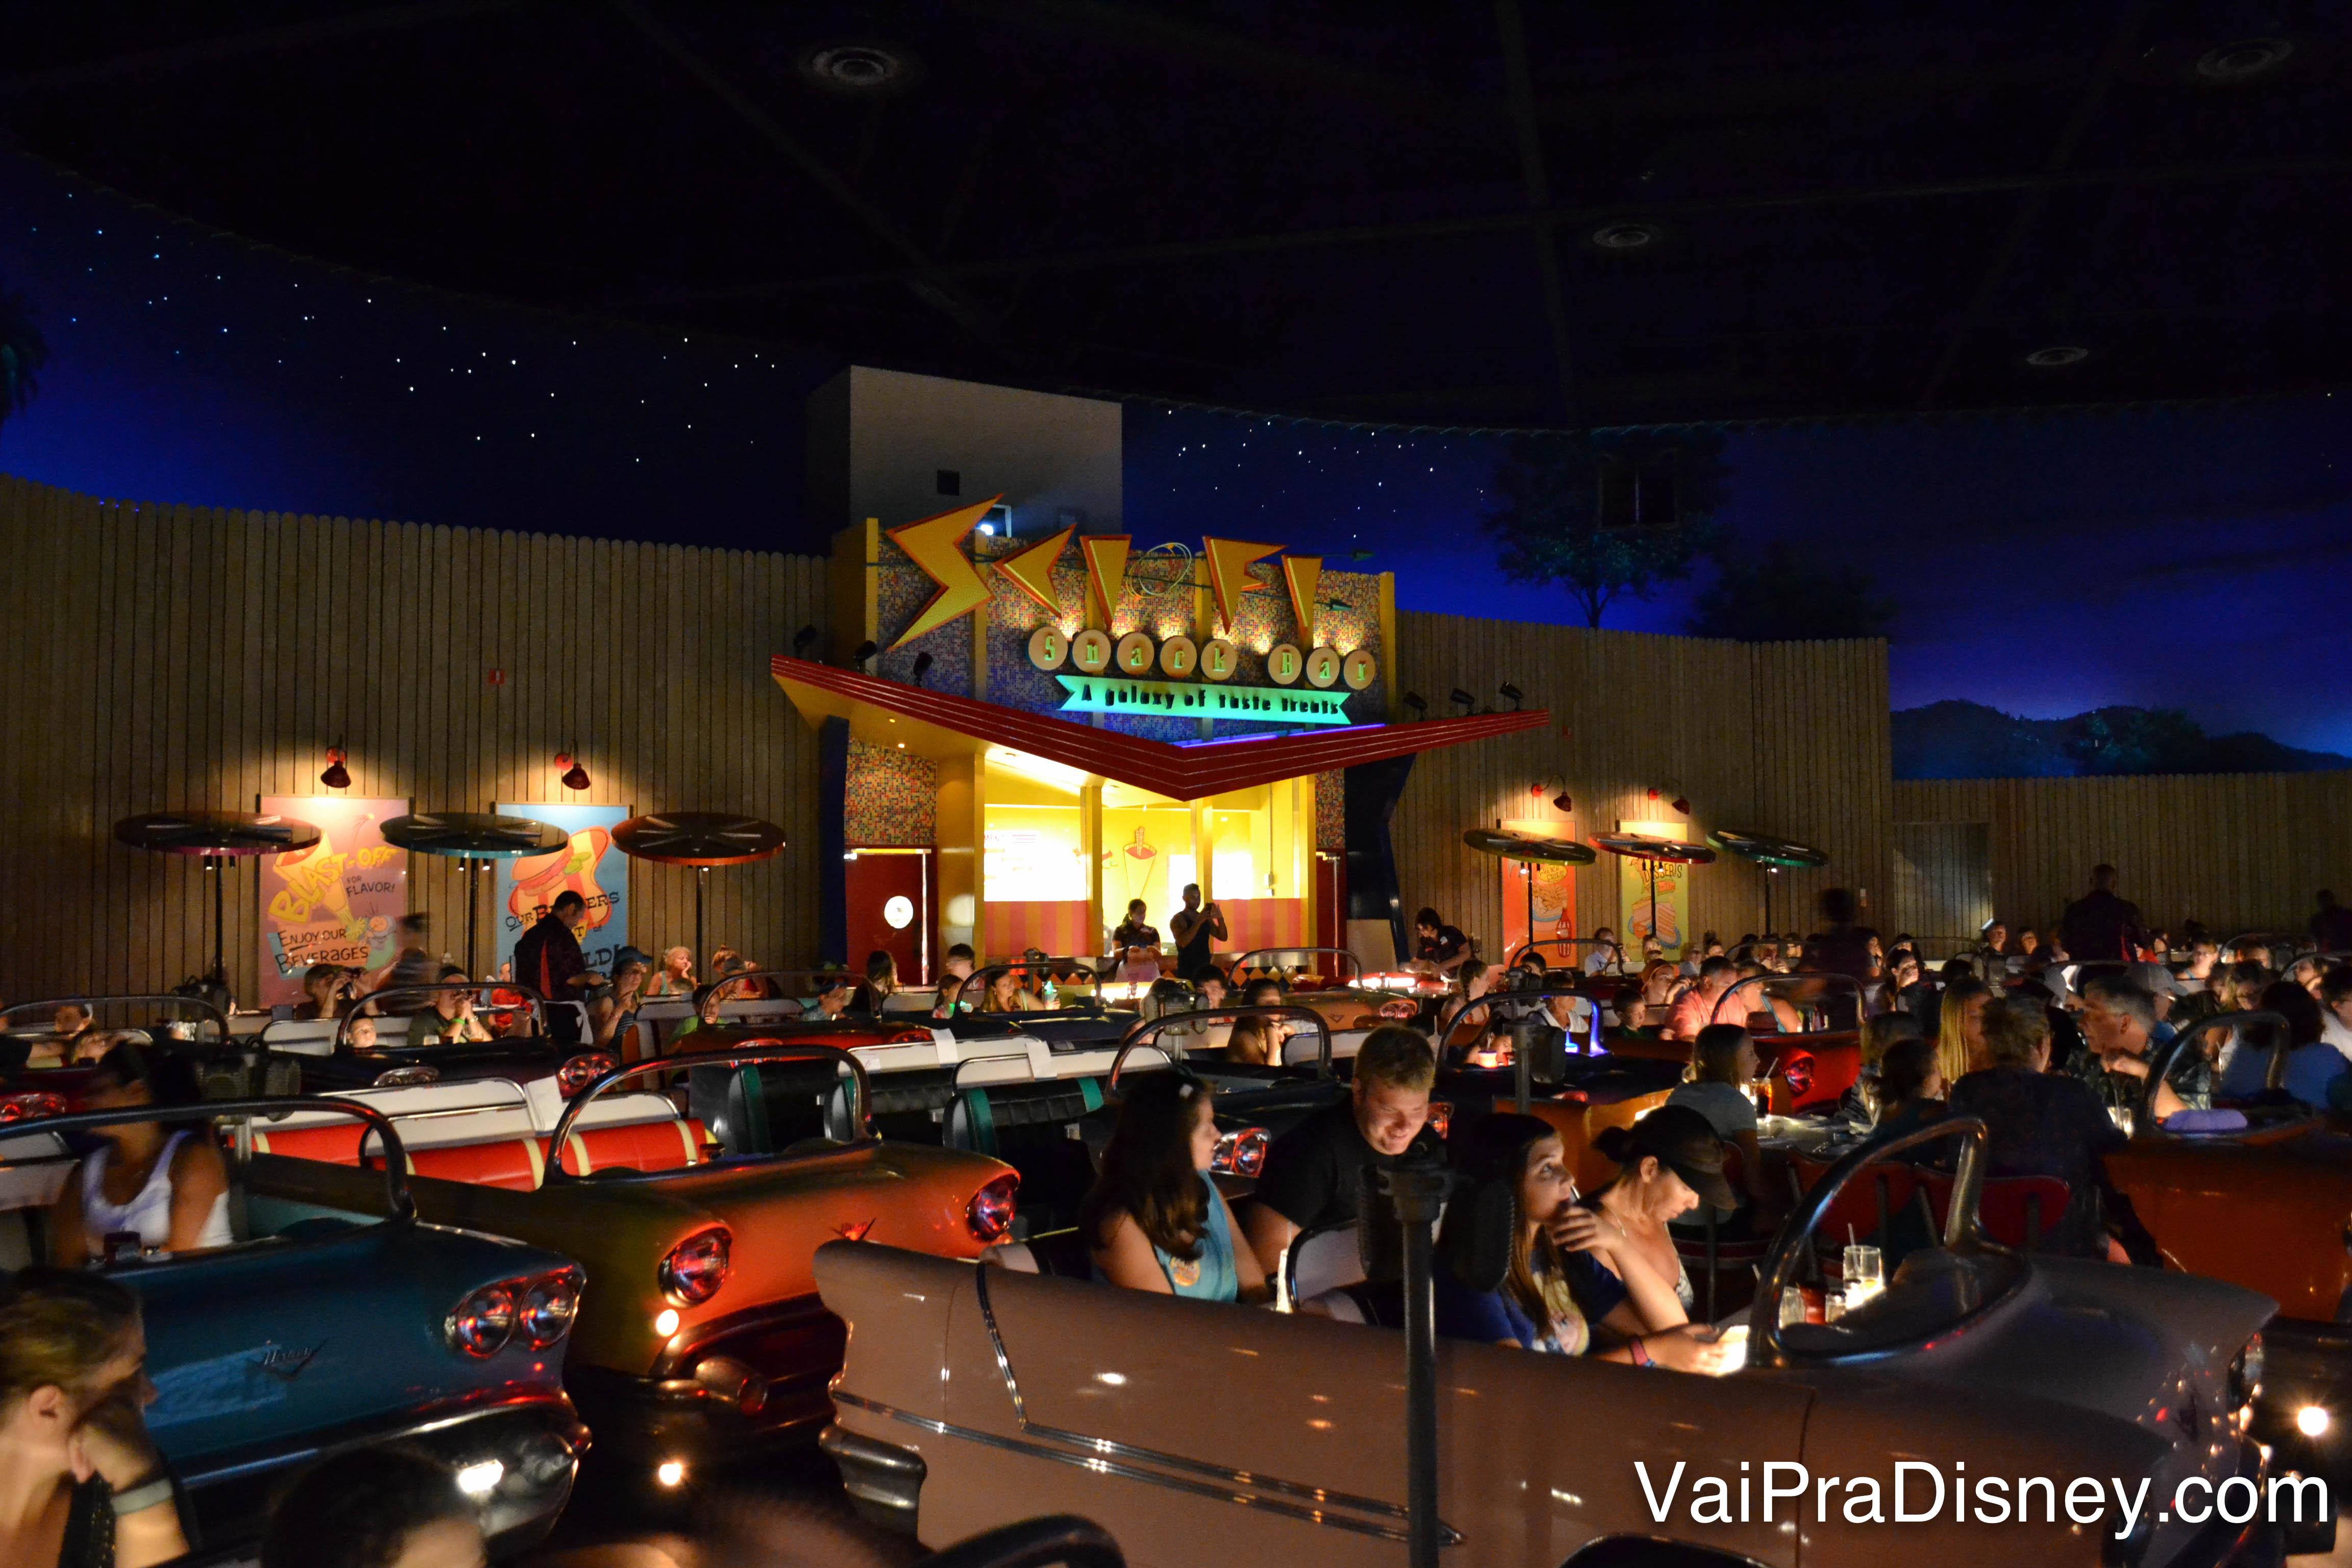 Foto do Sci-Fi Dine in Theater, o restaurante drive-in da Disney, com diversos carros antigos estacionados na frente e os visitantes dentro.